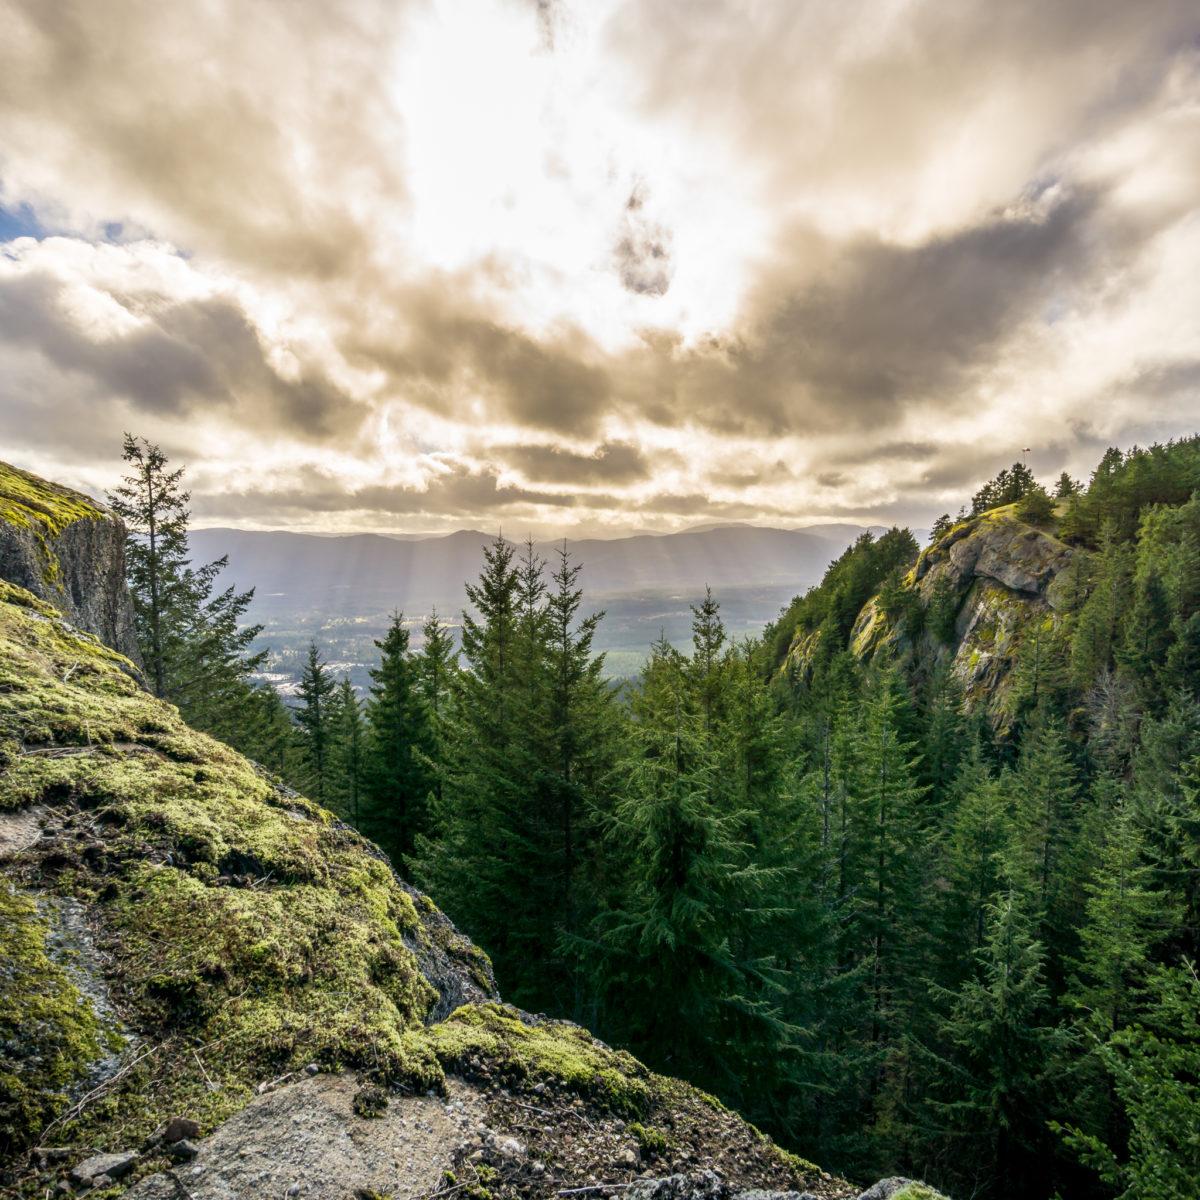 Mt Prevost_Cowichan Valley_Chris Istace-02615